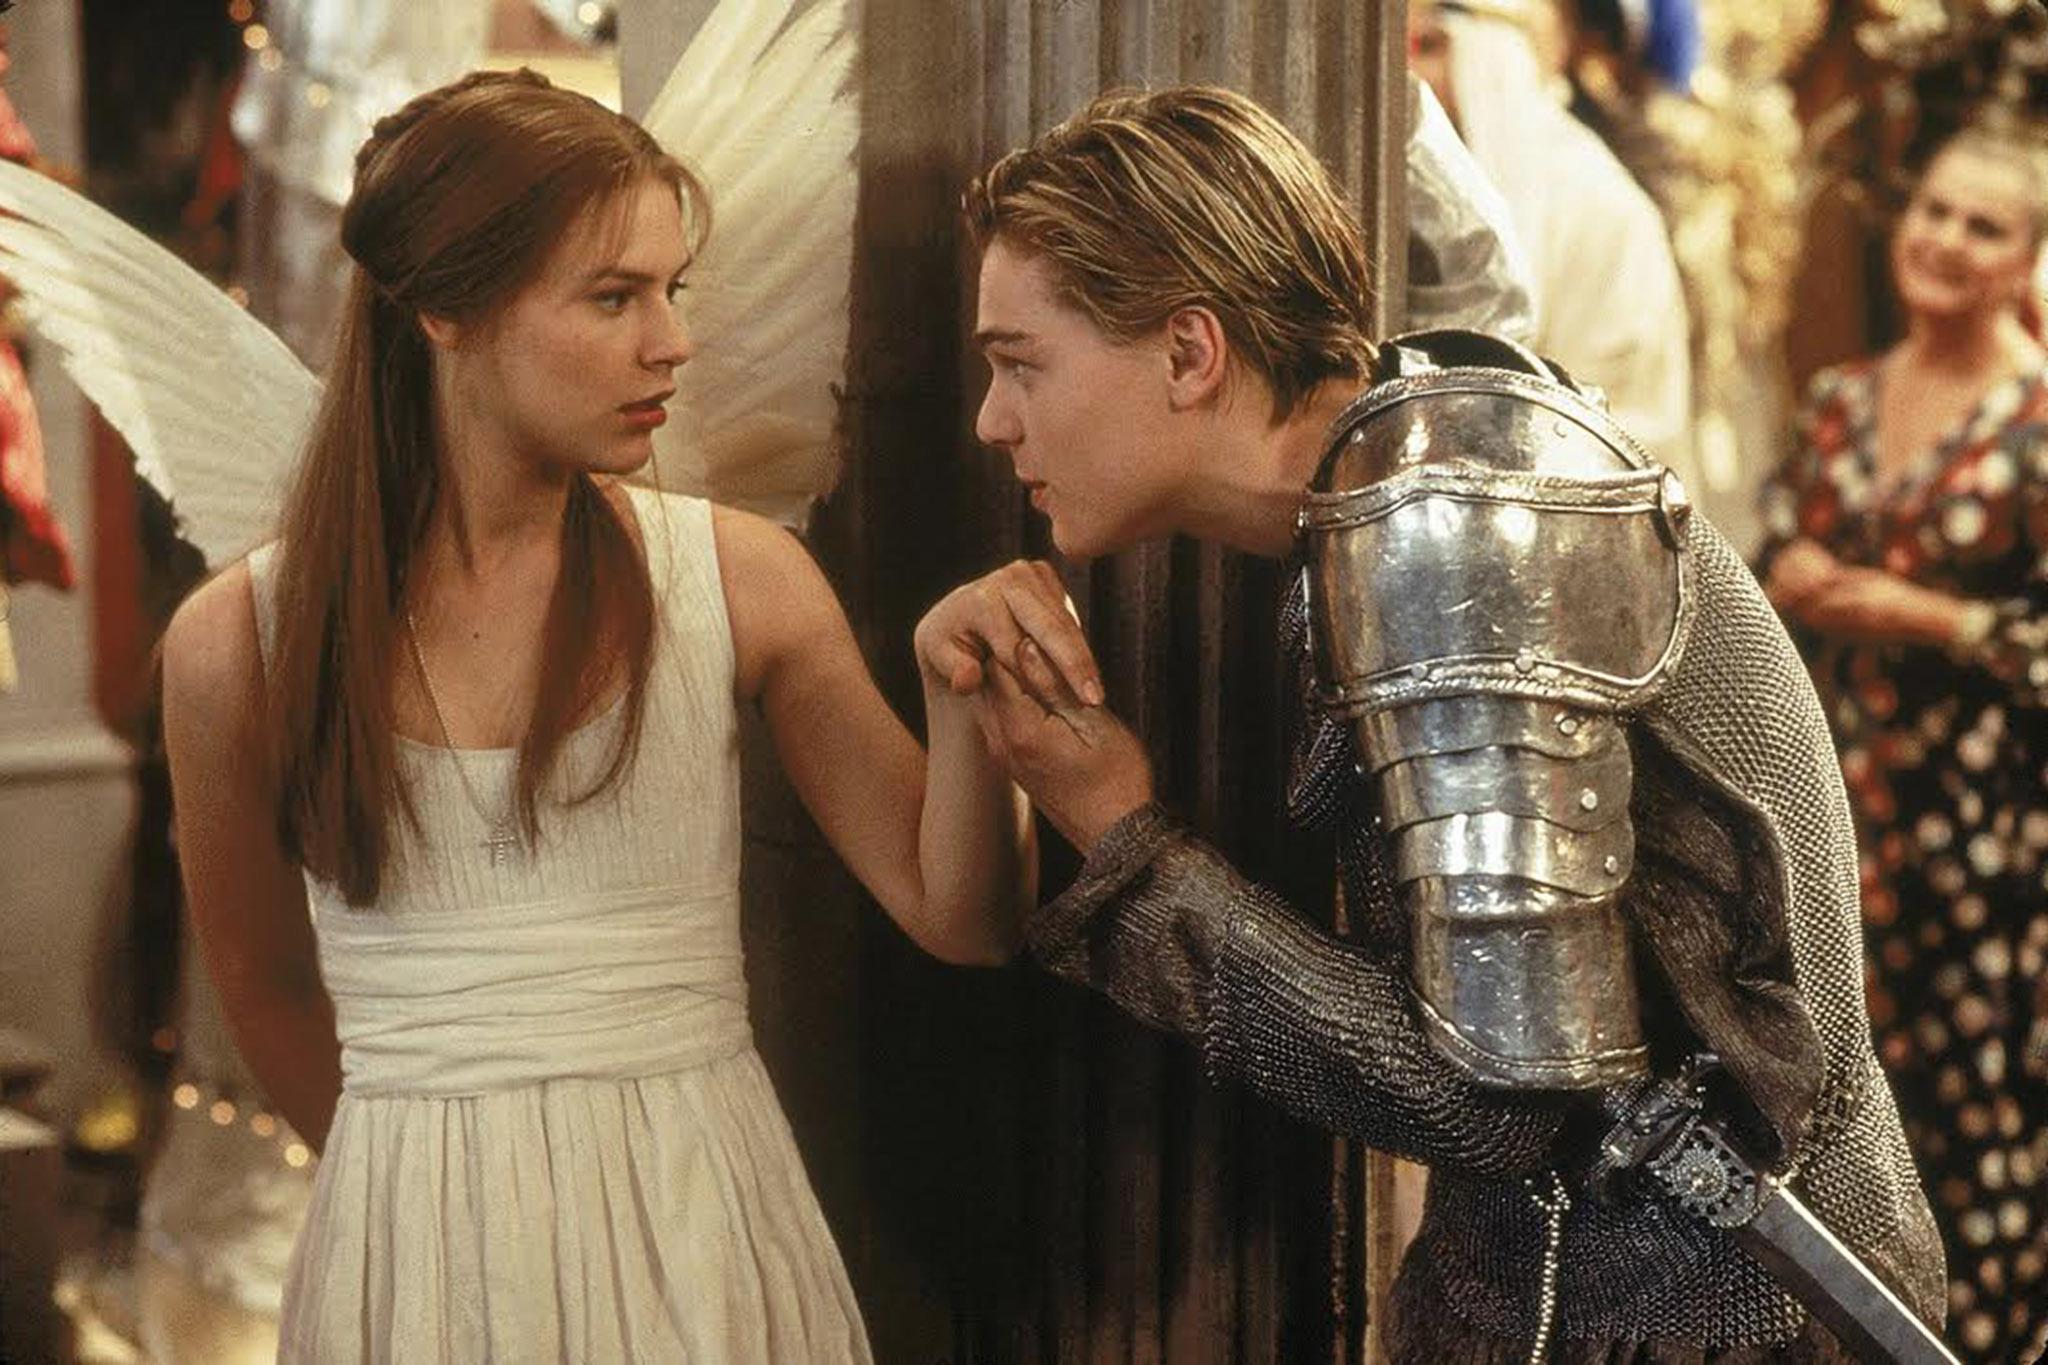 Claire Danes and Leonardo DiCaprio in ROMEO AND JULIET (1996)